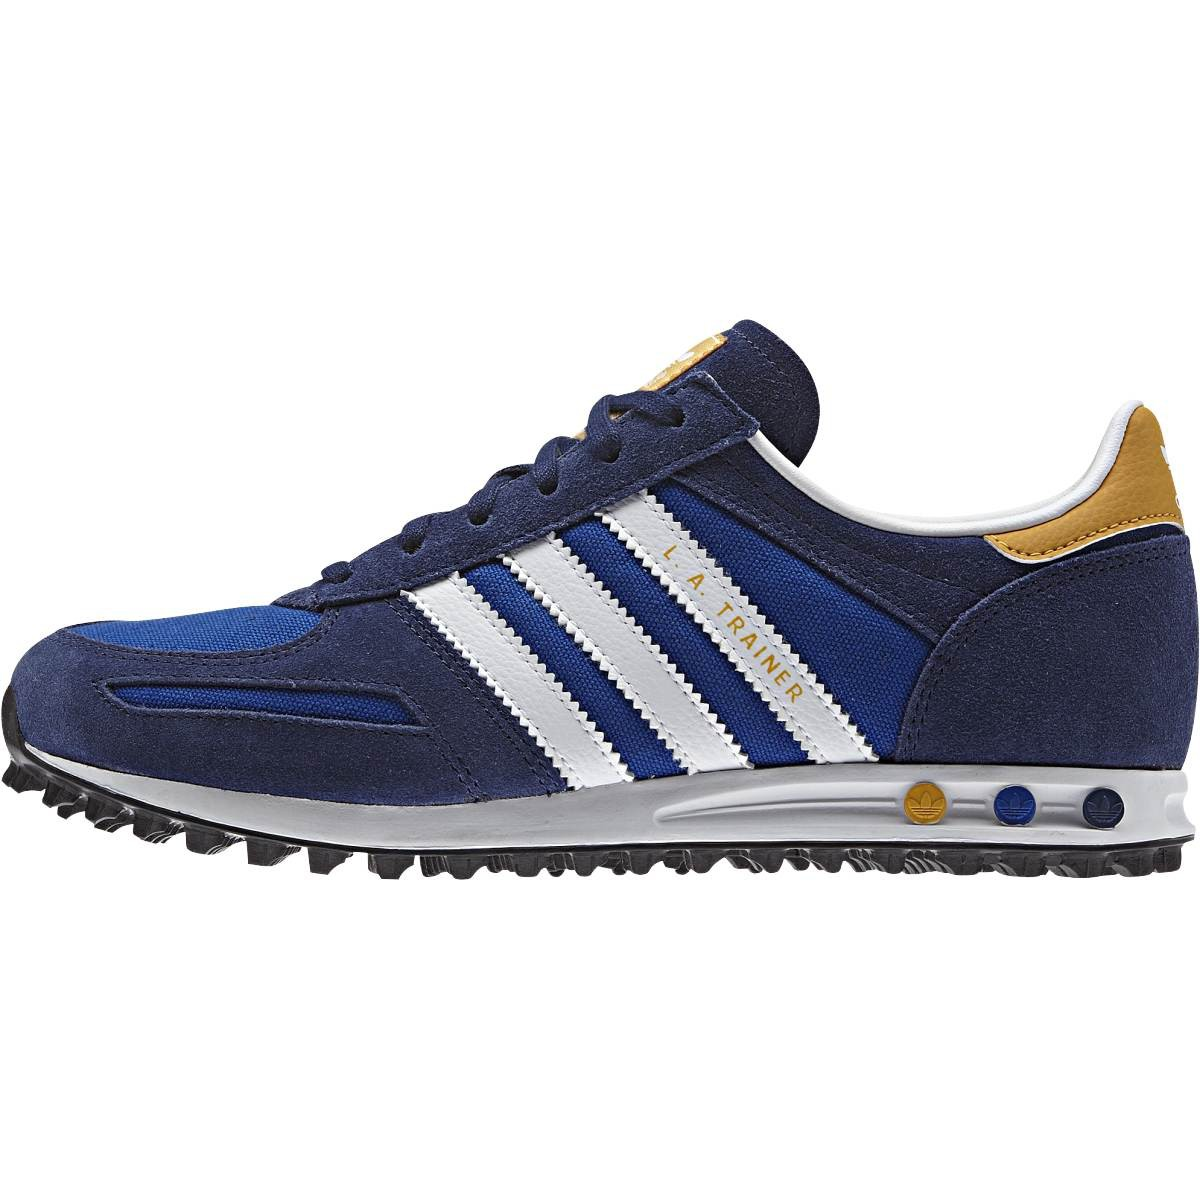 Dětské boty adidas Originals LA TRAINER K  88c5a2b0dc